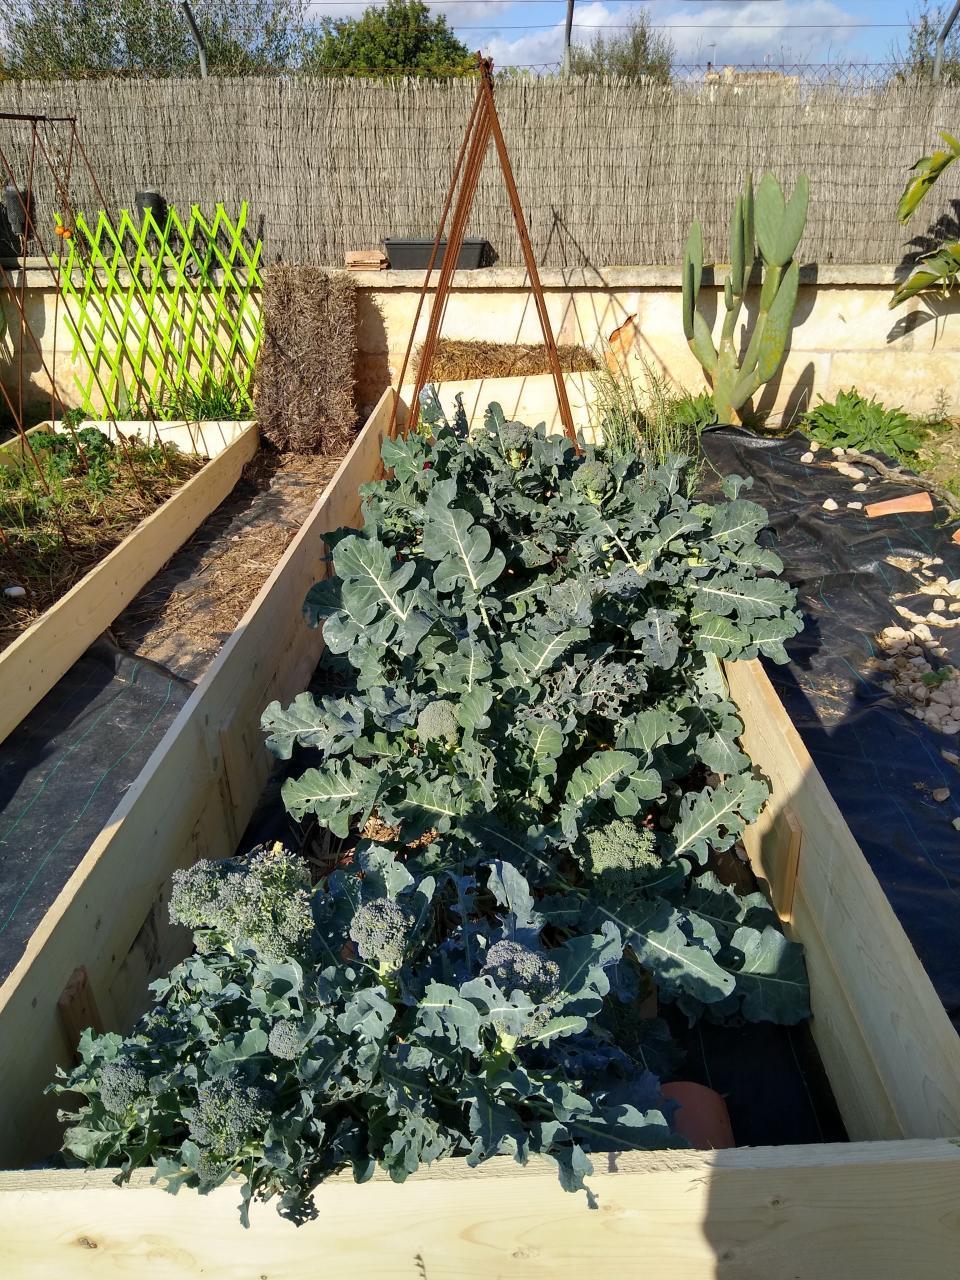 Rows of Broccoli